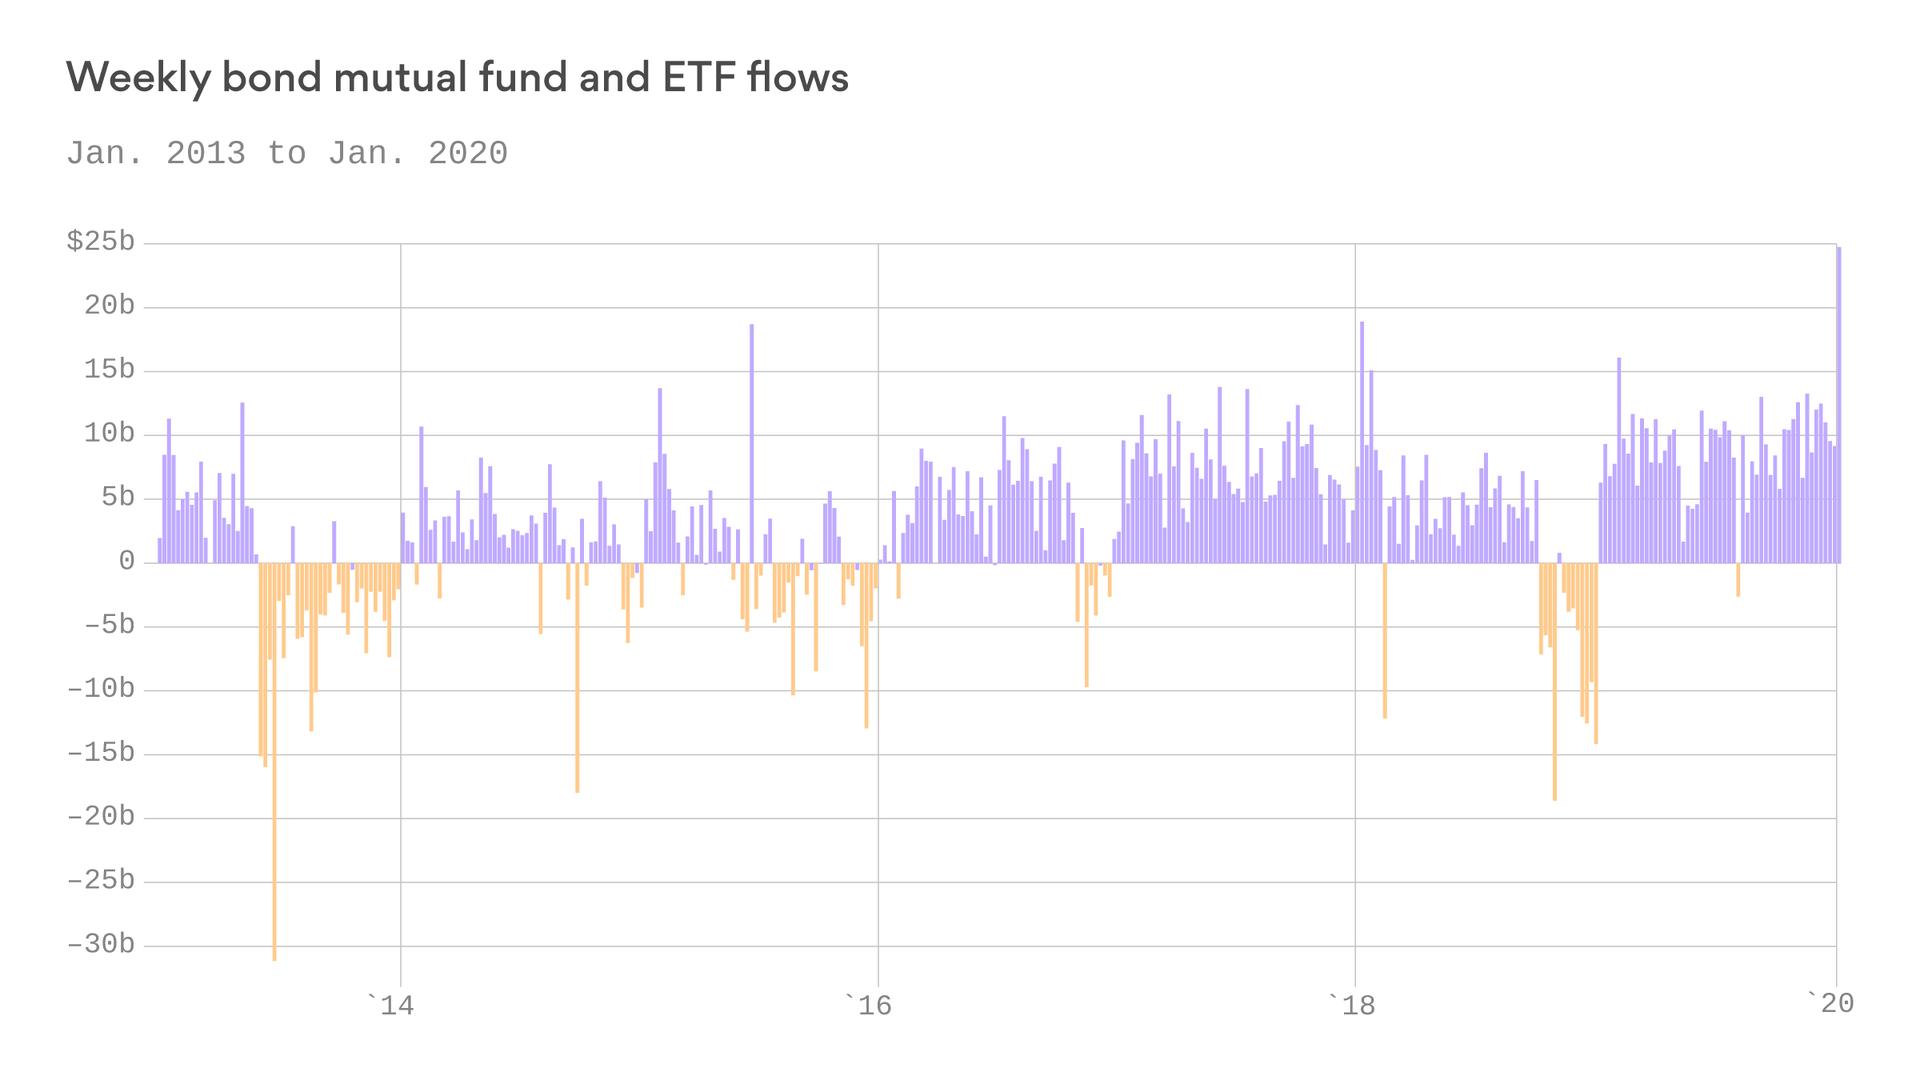 Investors poured record cash into bonds last week